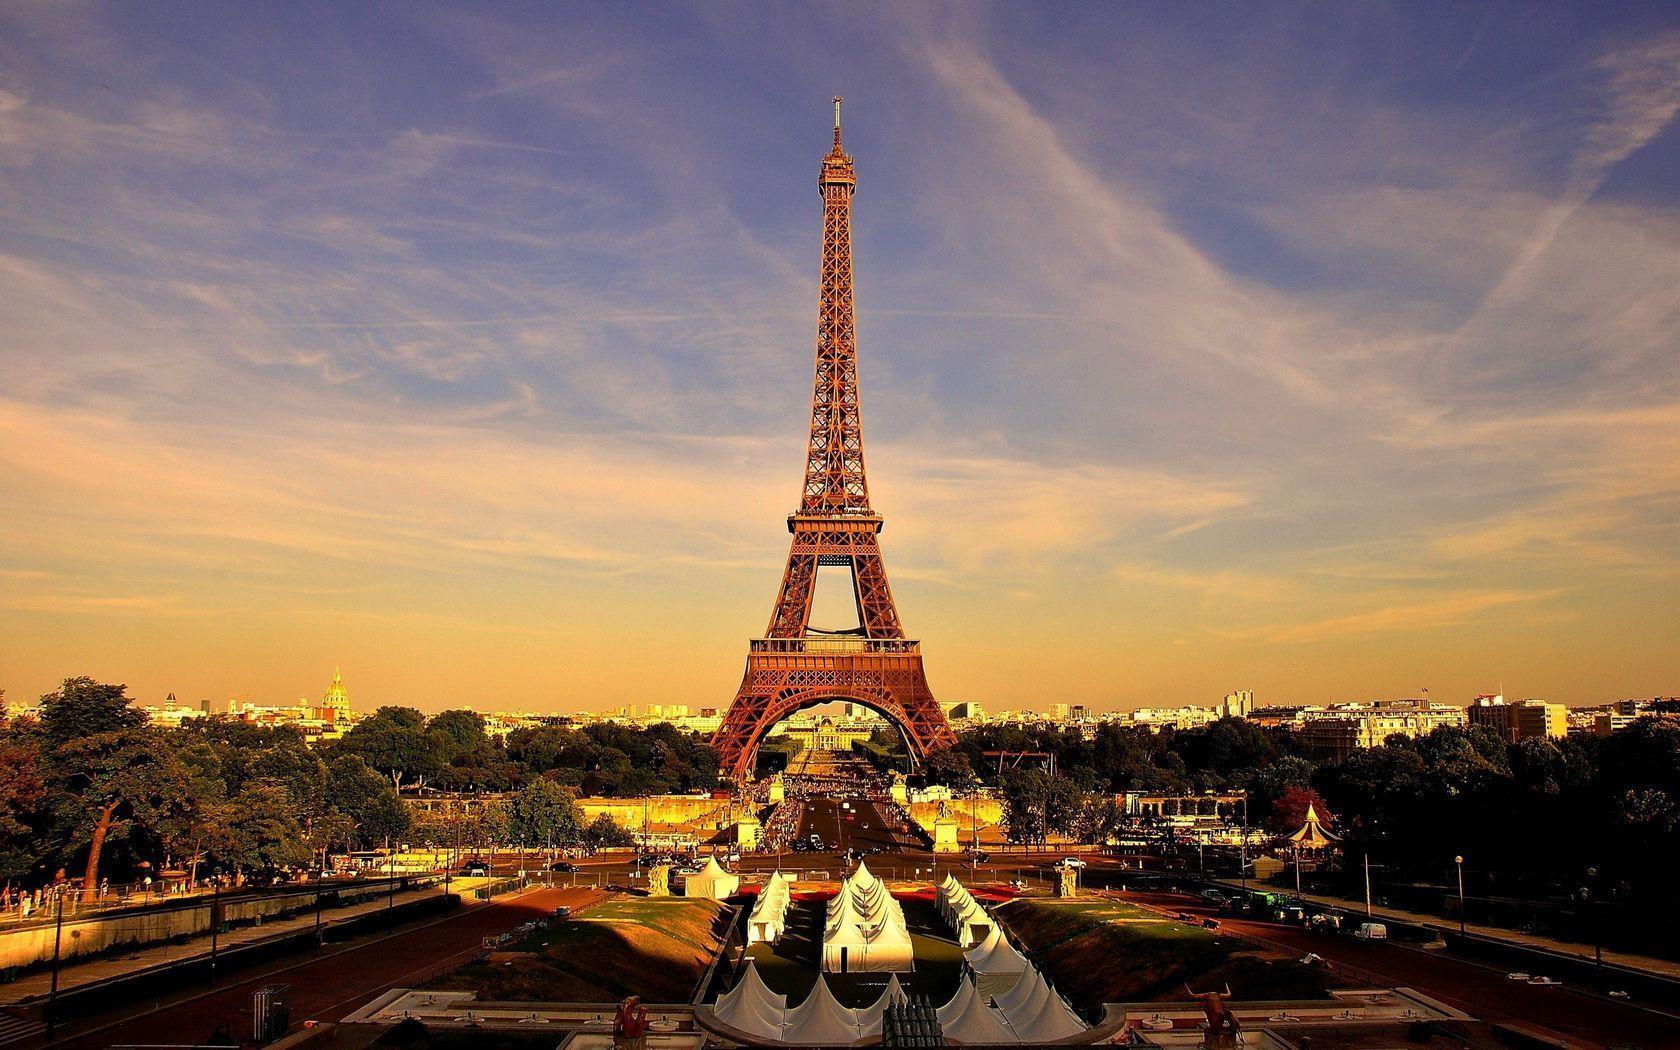 Tour Eiffel Wallpapers Top Free Tour Eiffel Backgrounds